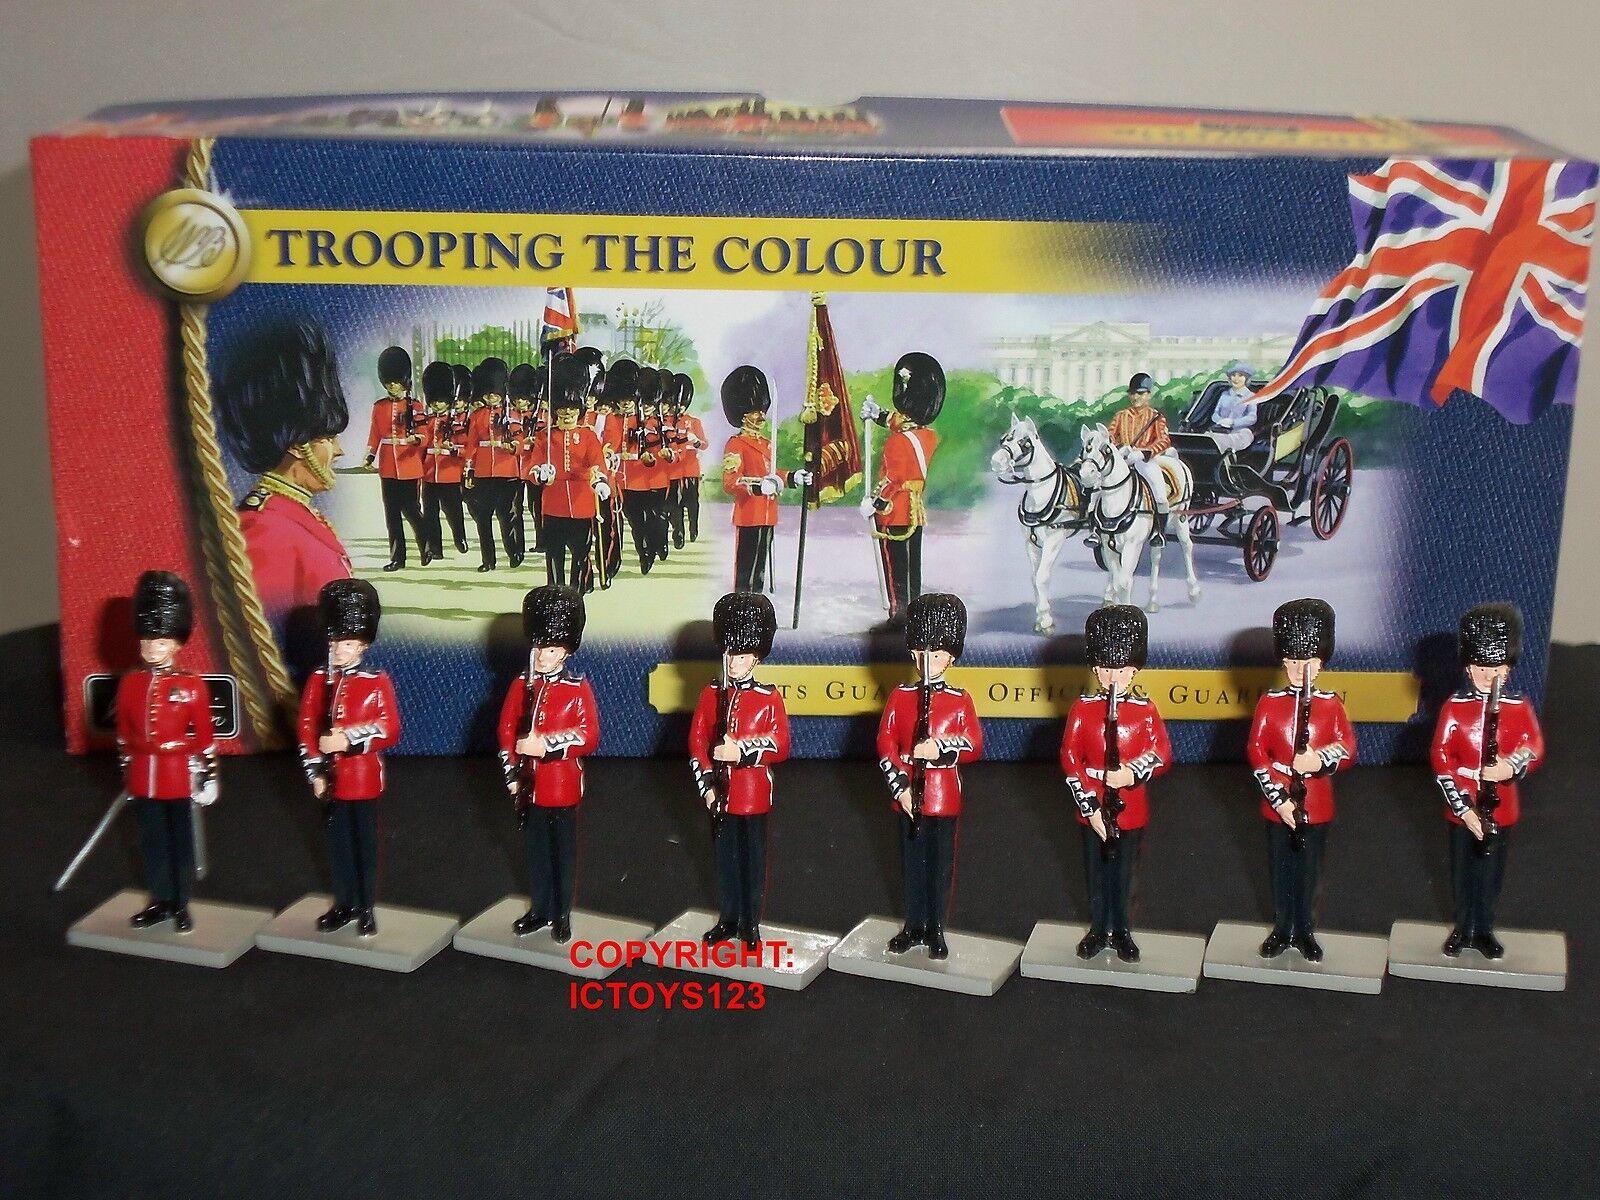 BRITAINS 40115 SCOTS GUARDS OFFICER + GUARDSMEN METAL TOY SOLDIER FIGURE SET